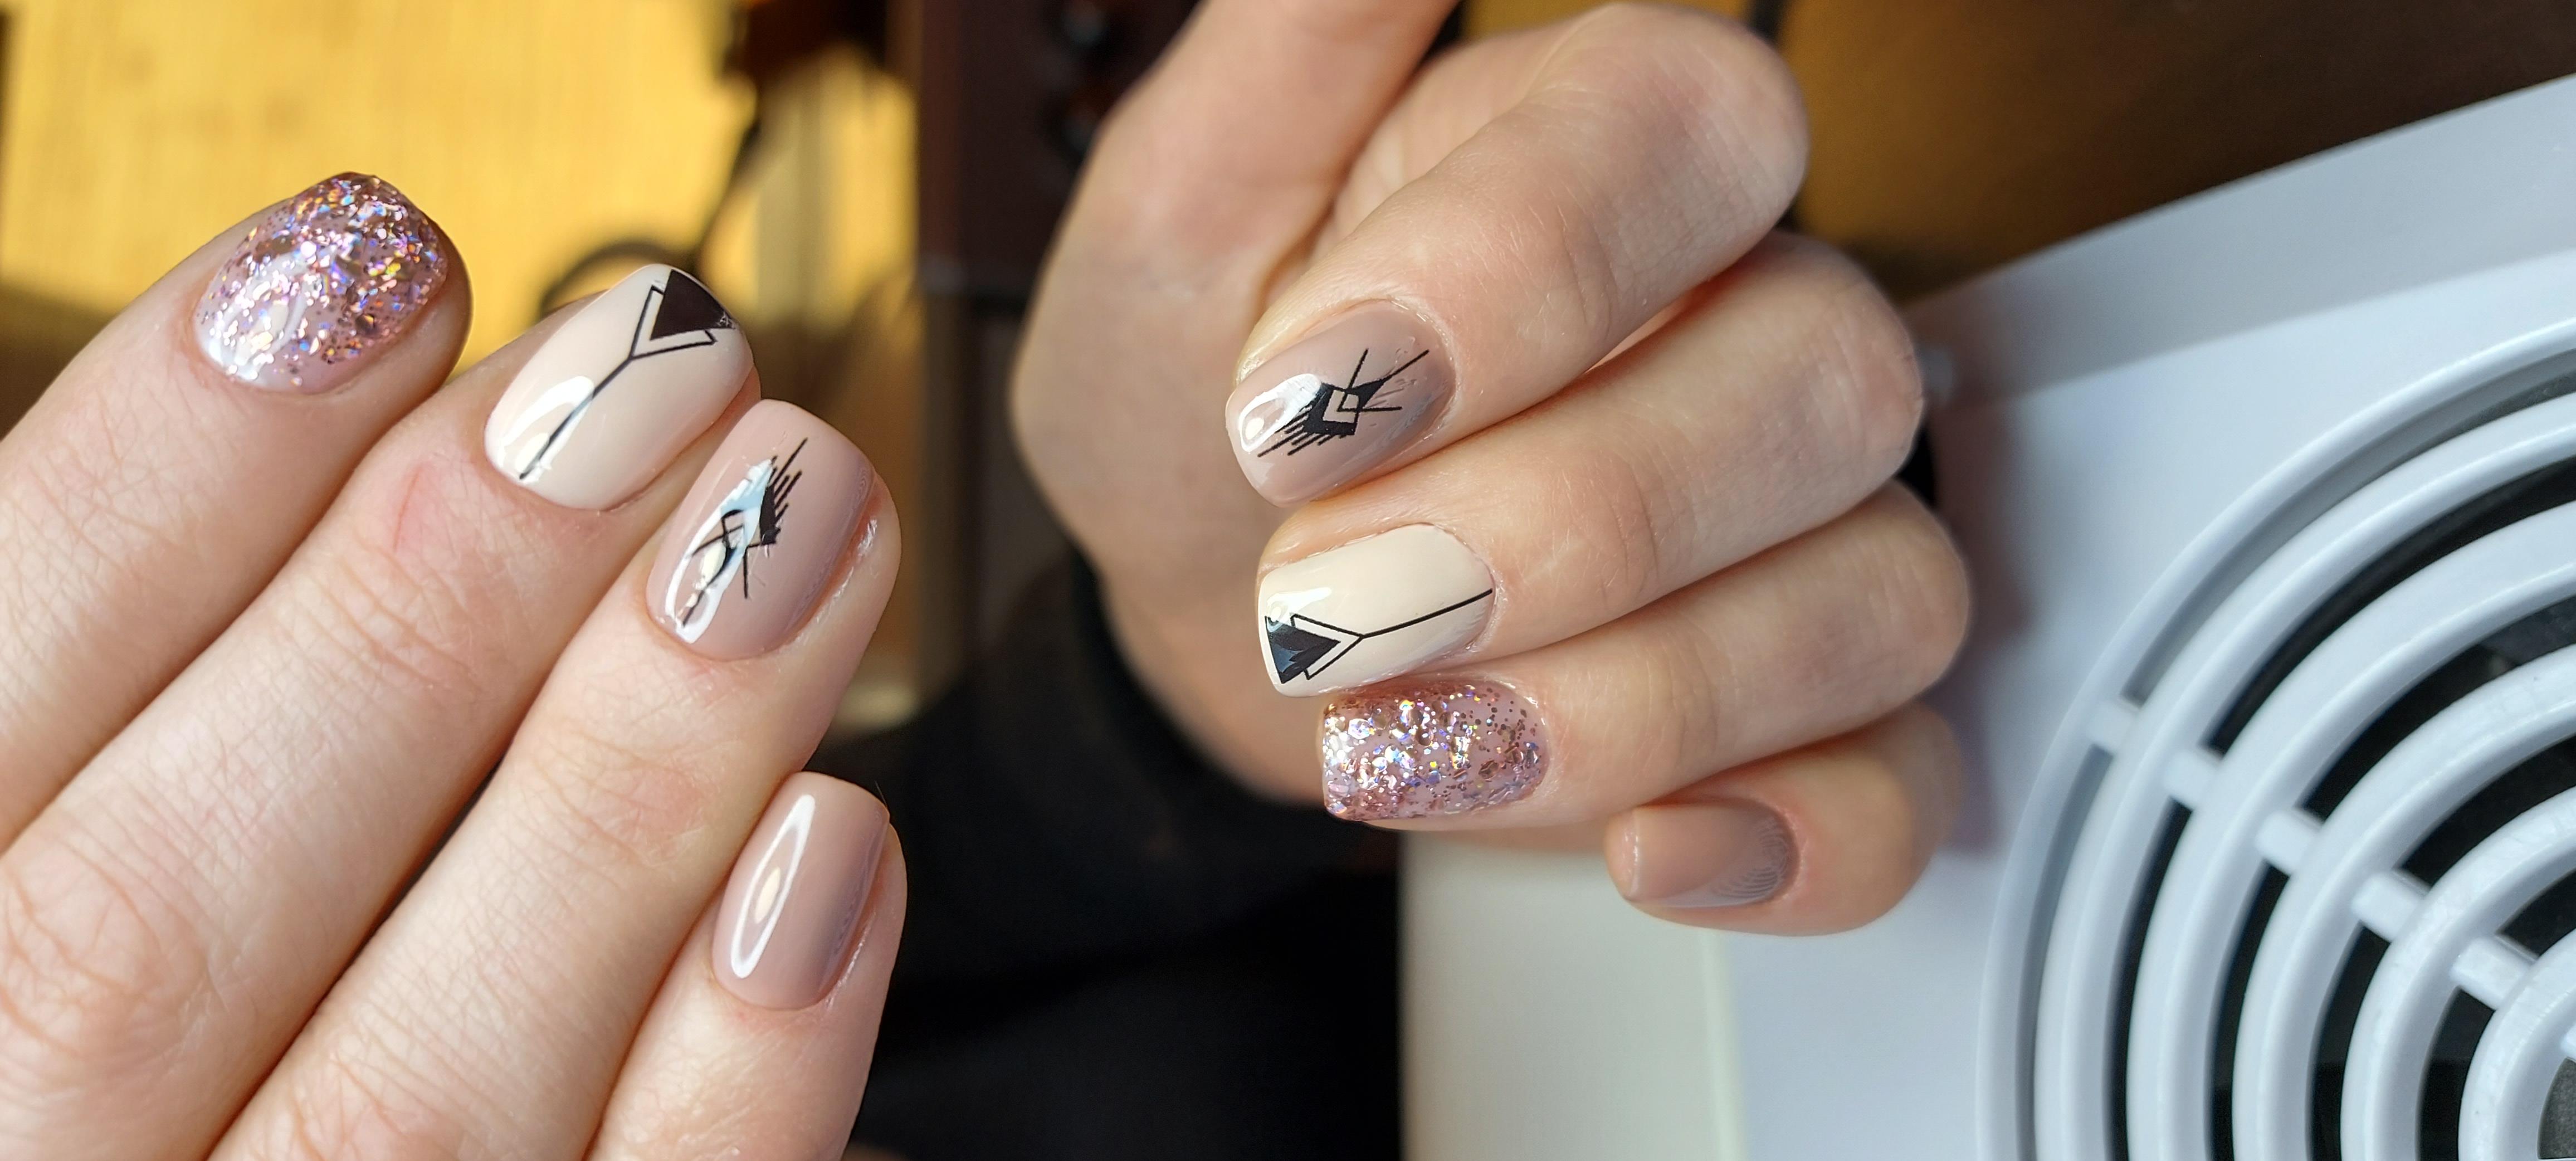 Маникюр с геометрическими слайдерами и блестками в бежевом цвете на короткие ногти.